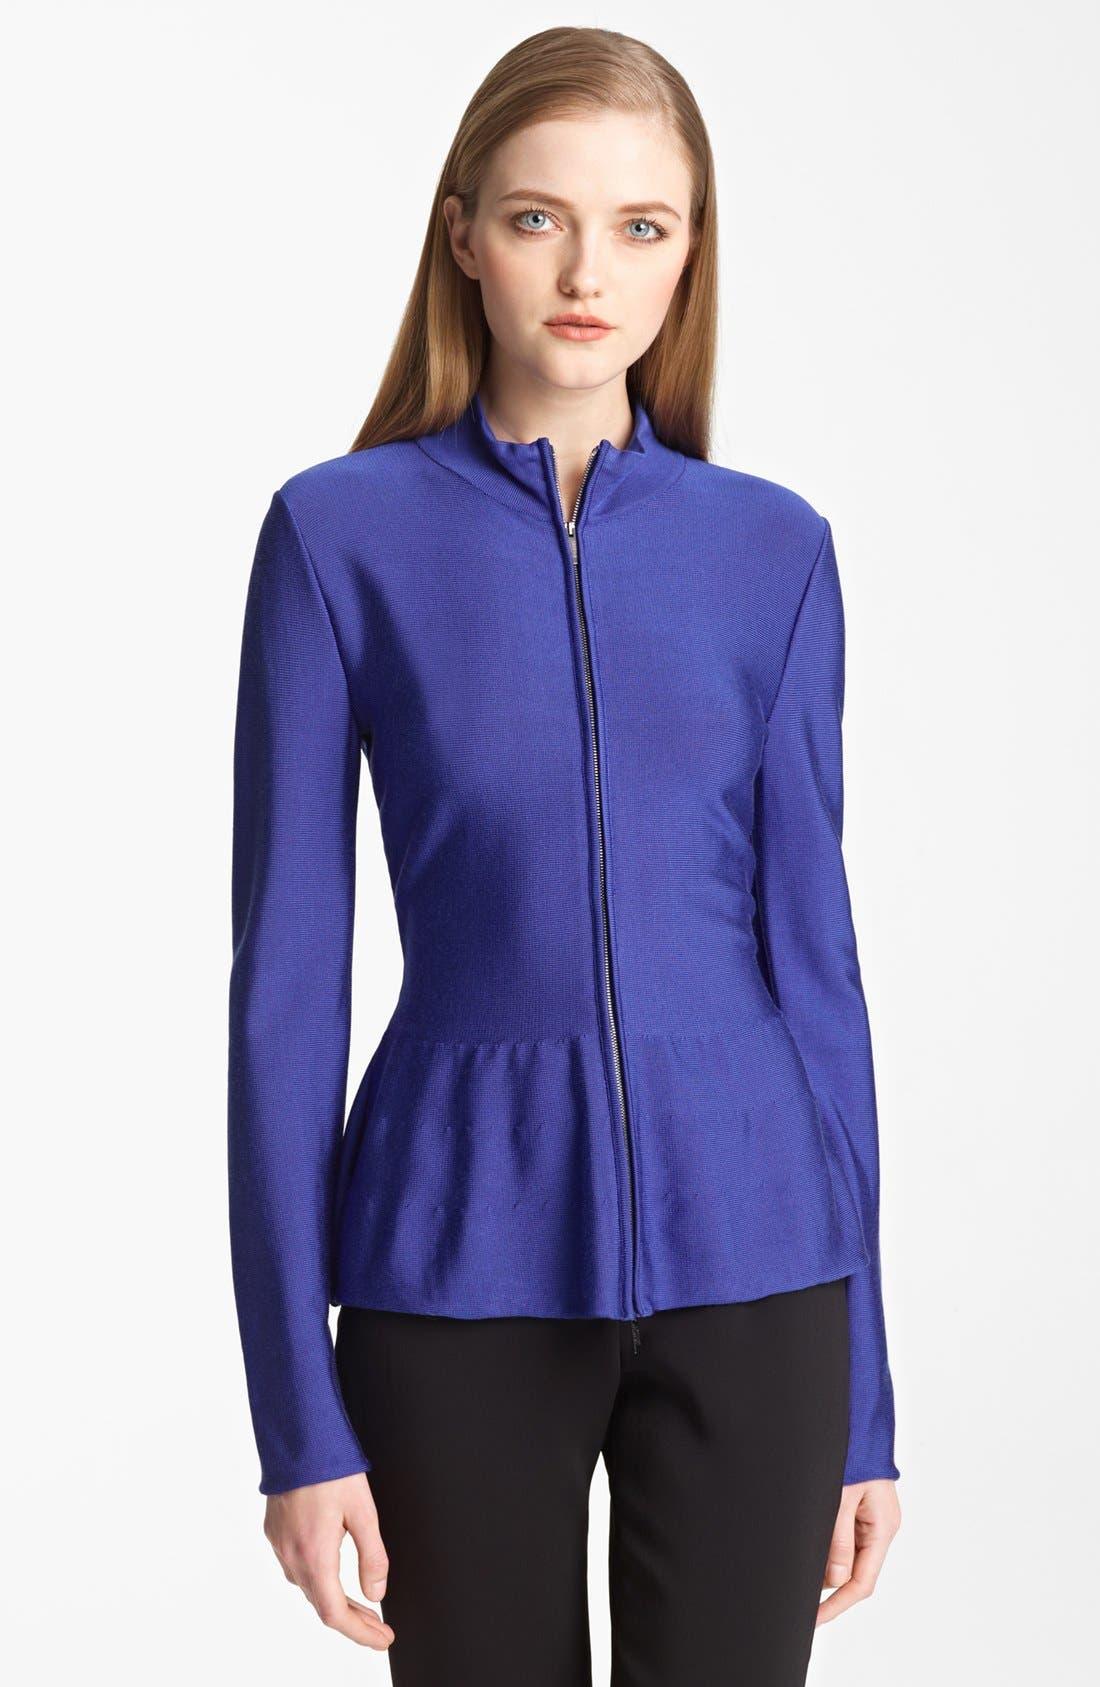 Main Image - Armani Collezioni Zip Front Knit Jacket